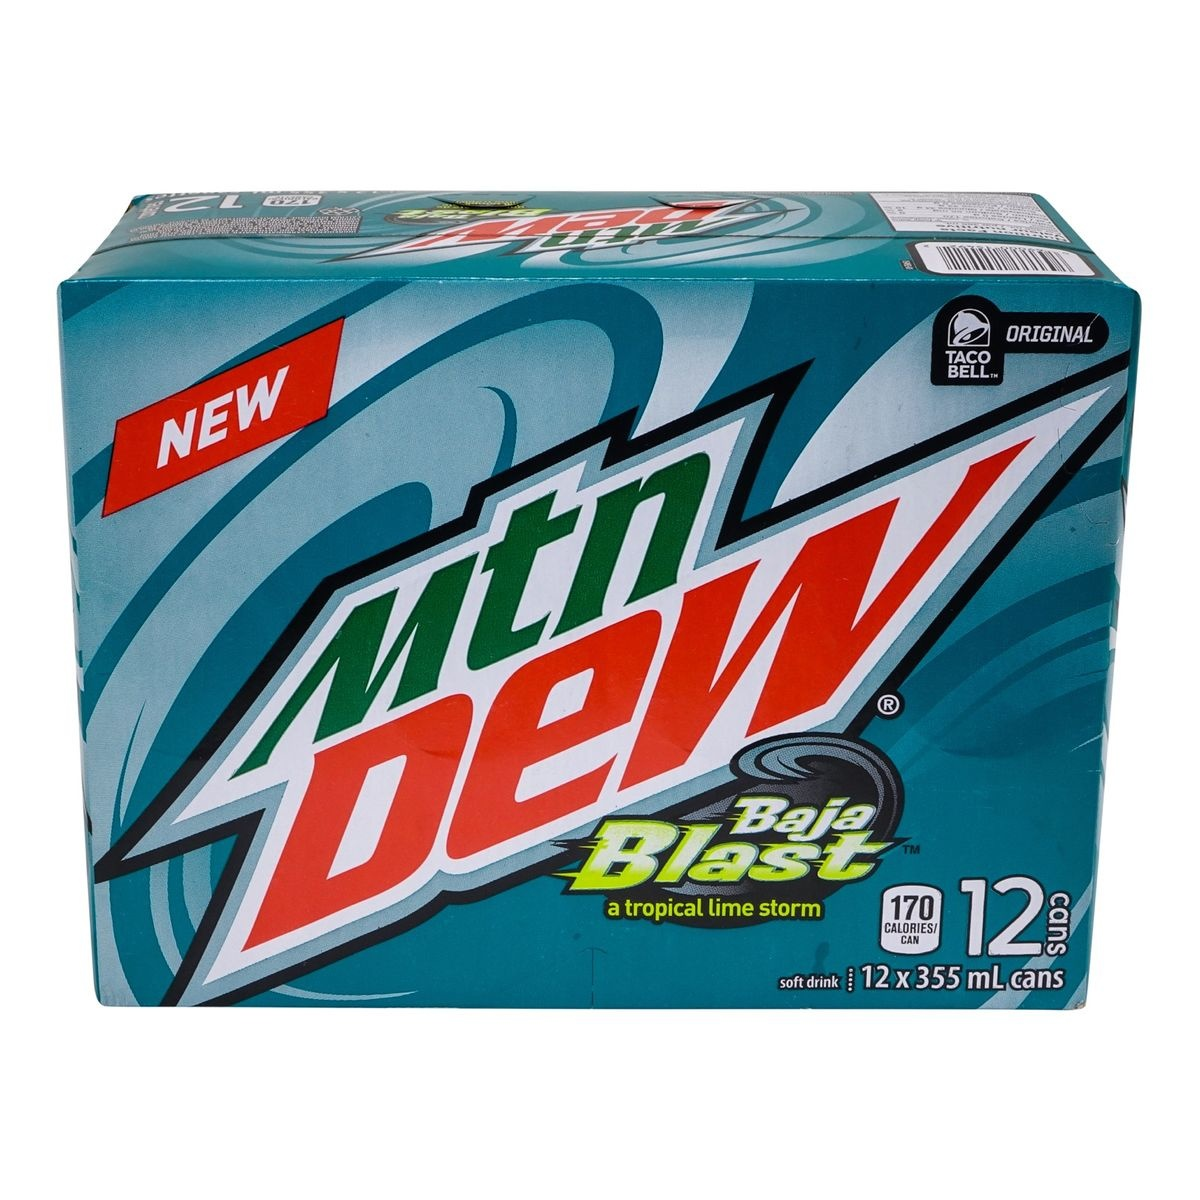 Mountain Dew Mountain Dew - Baja Blast Limited Edition 12-Pack